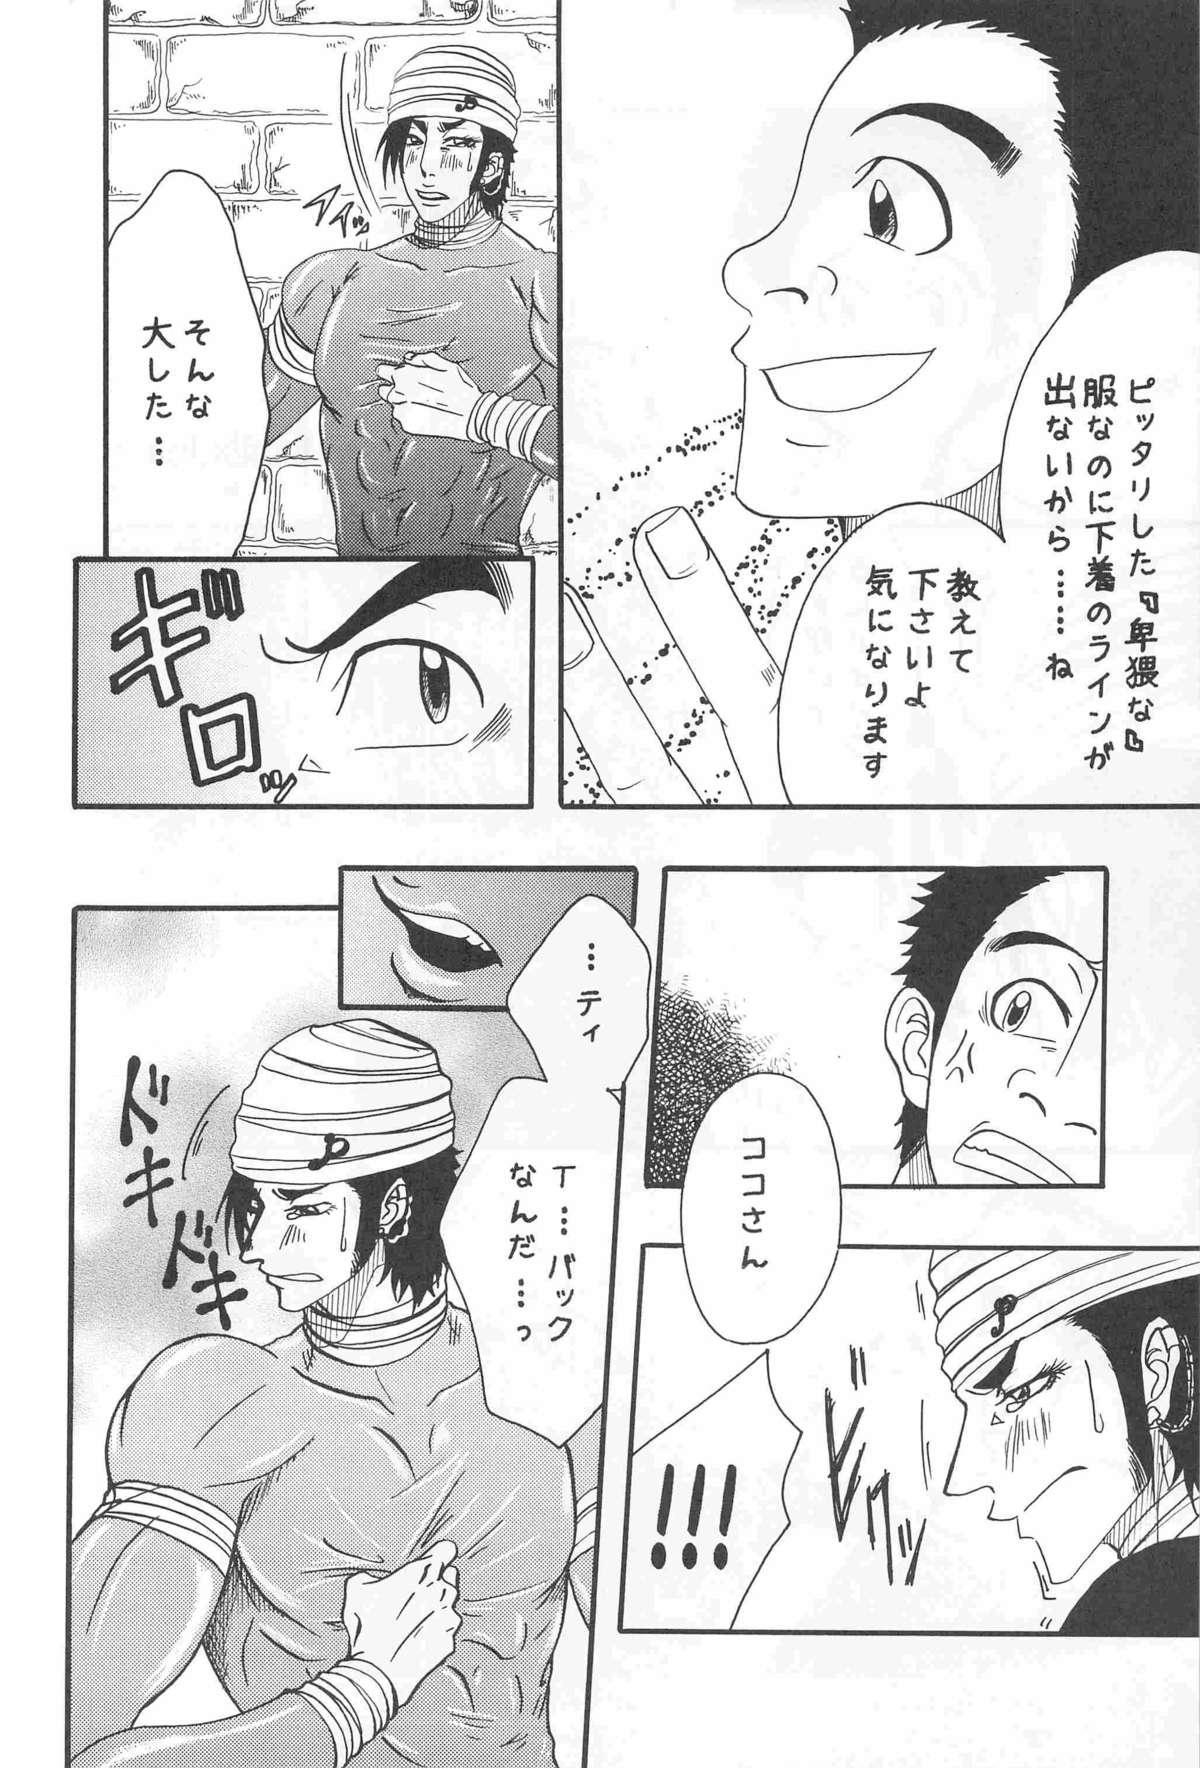 [Kijima Hyougo,Jun'ai Meringue-don,RIN!] [msbt] (Toriko) 17